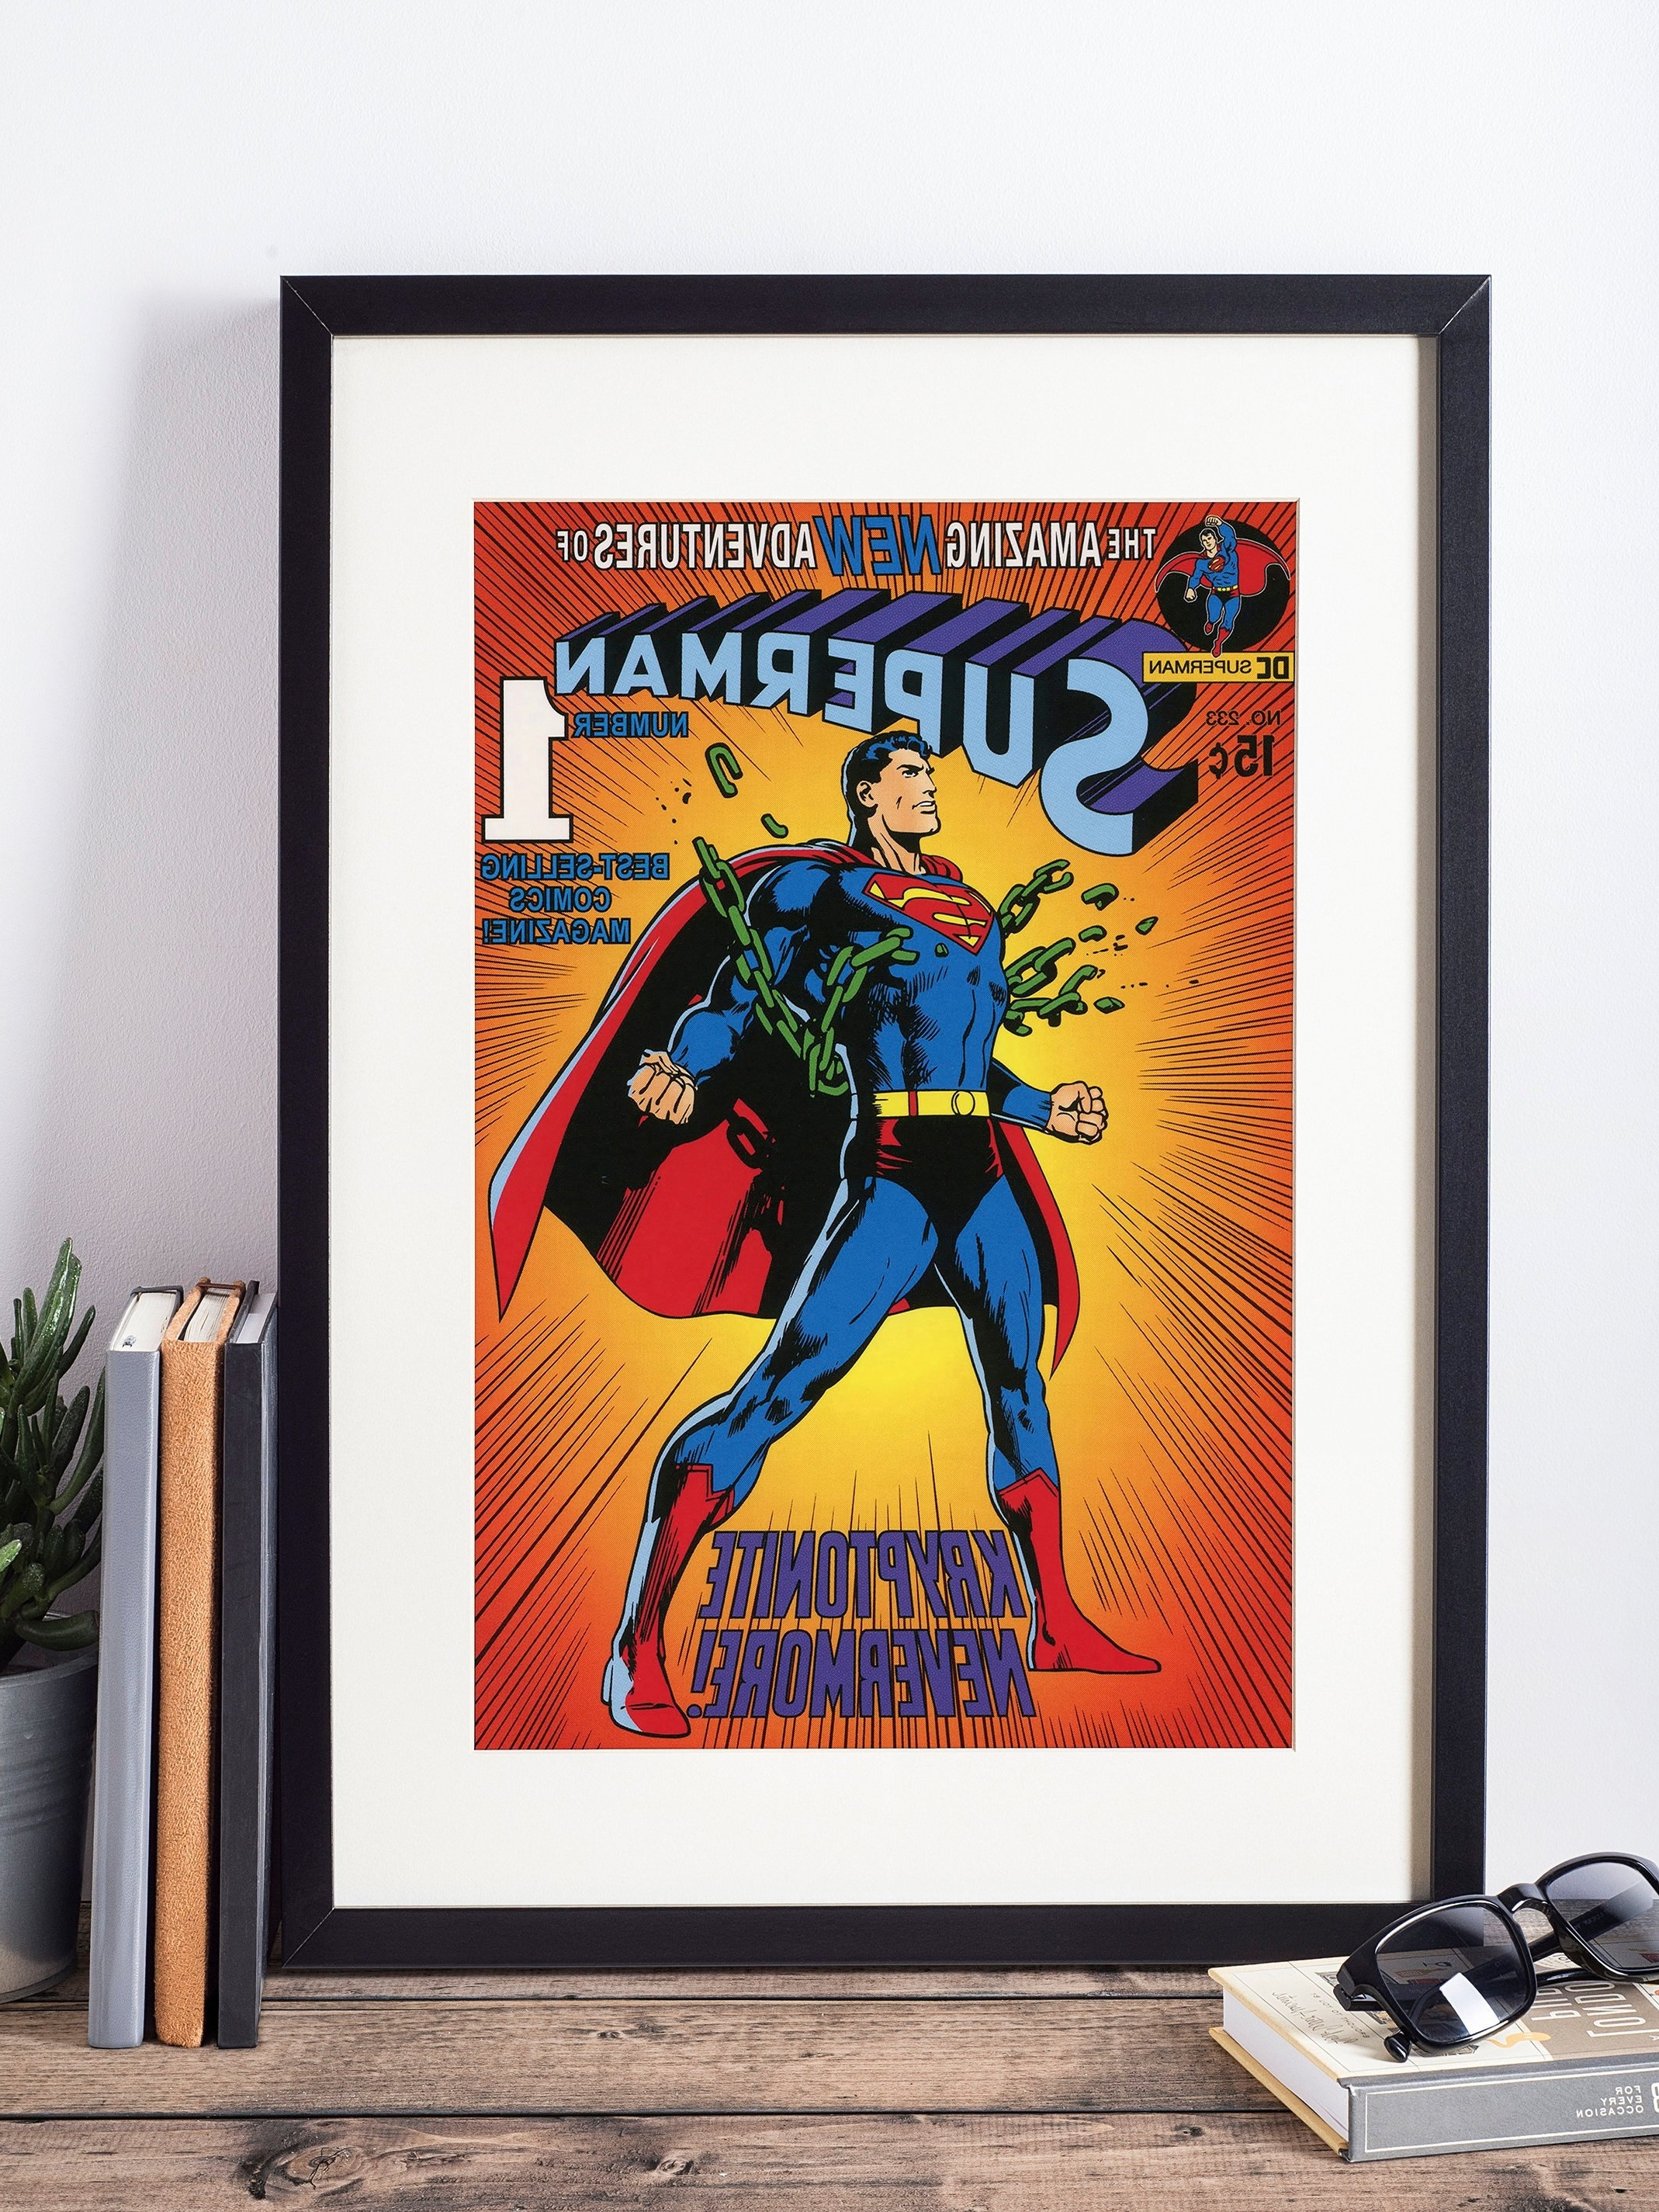 2017 Superhero Wall Art Inside Superman Poster / Superhero Wall Art / Superman Art / Nerd Gift (View 5 of 15)